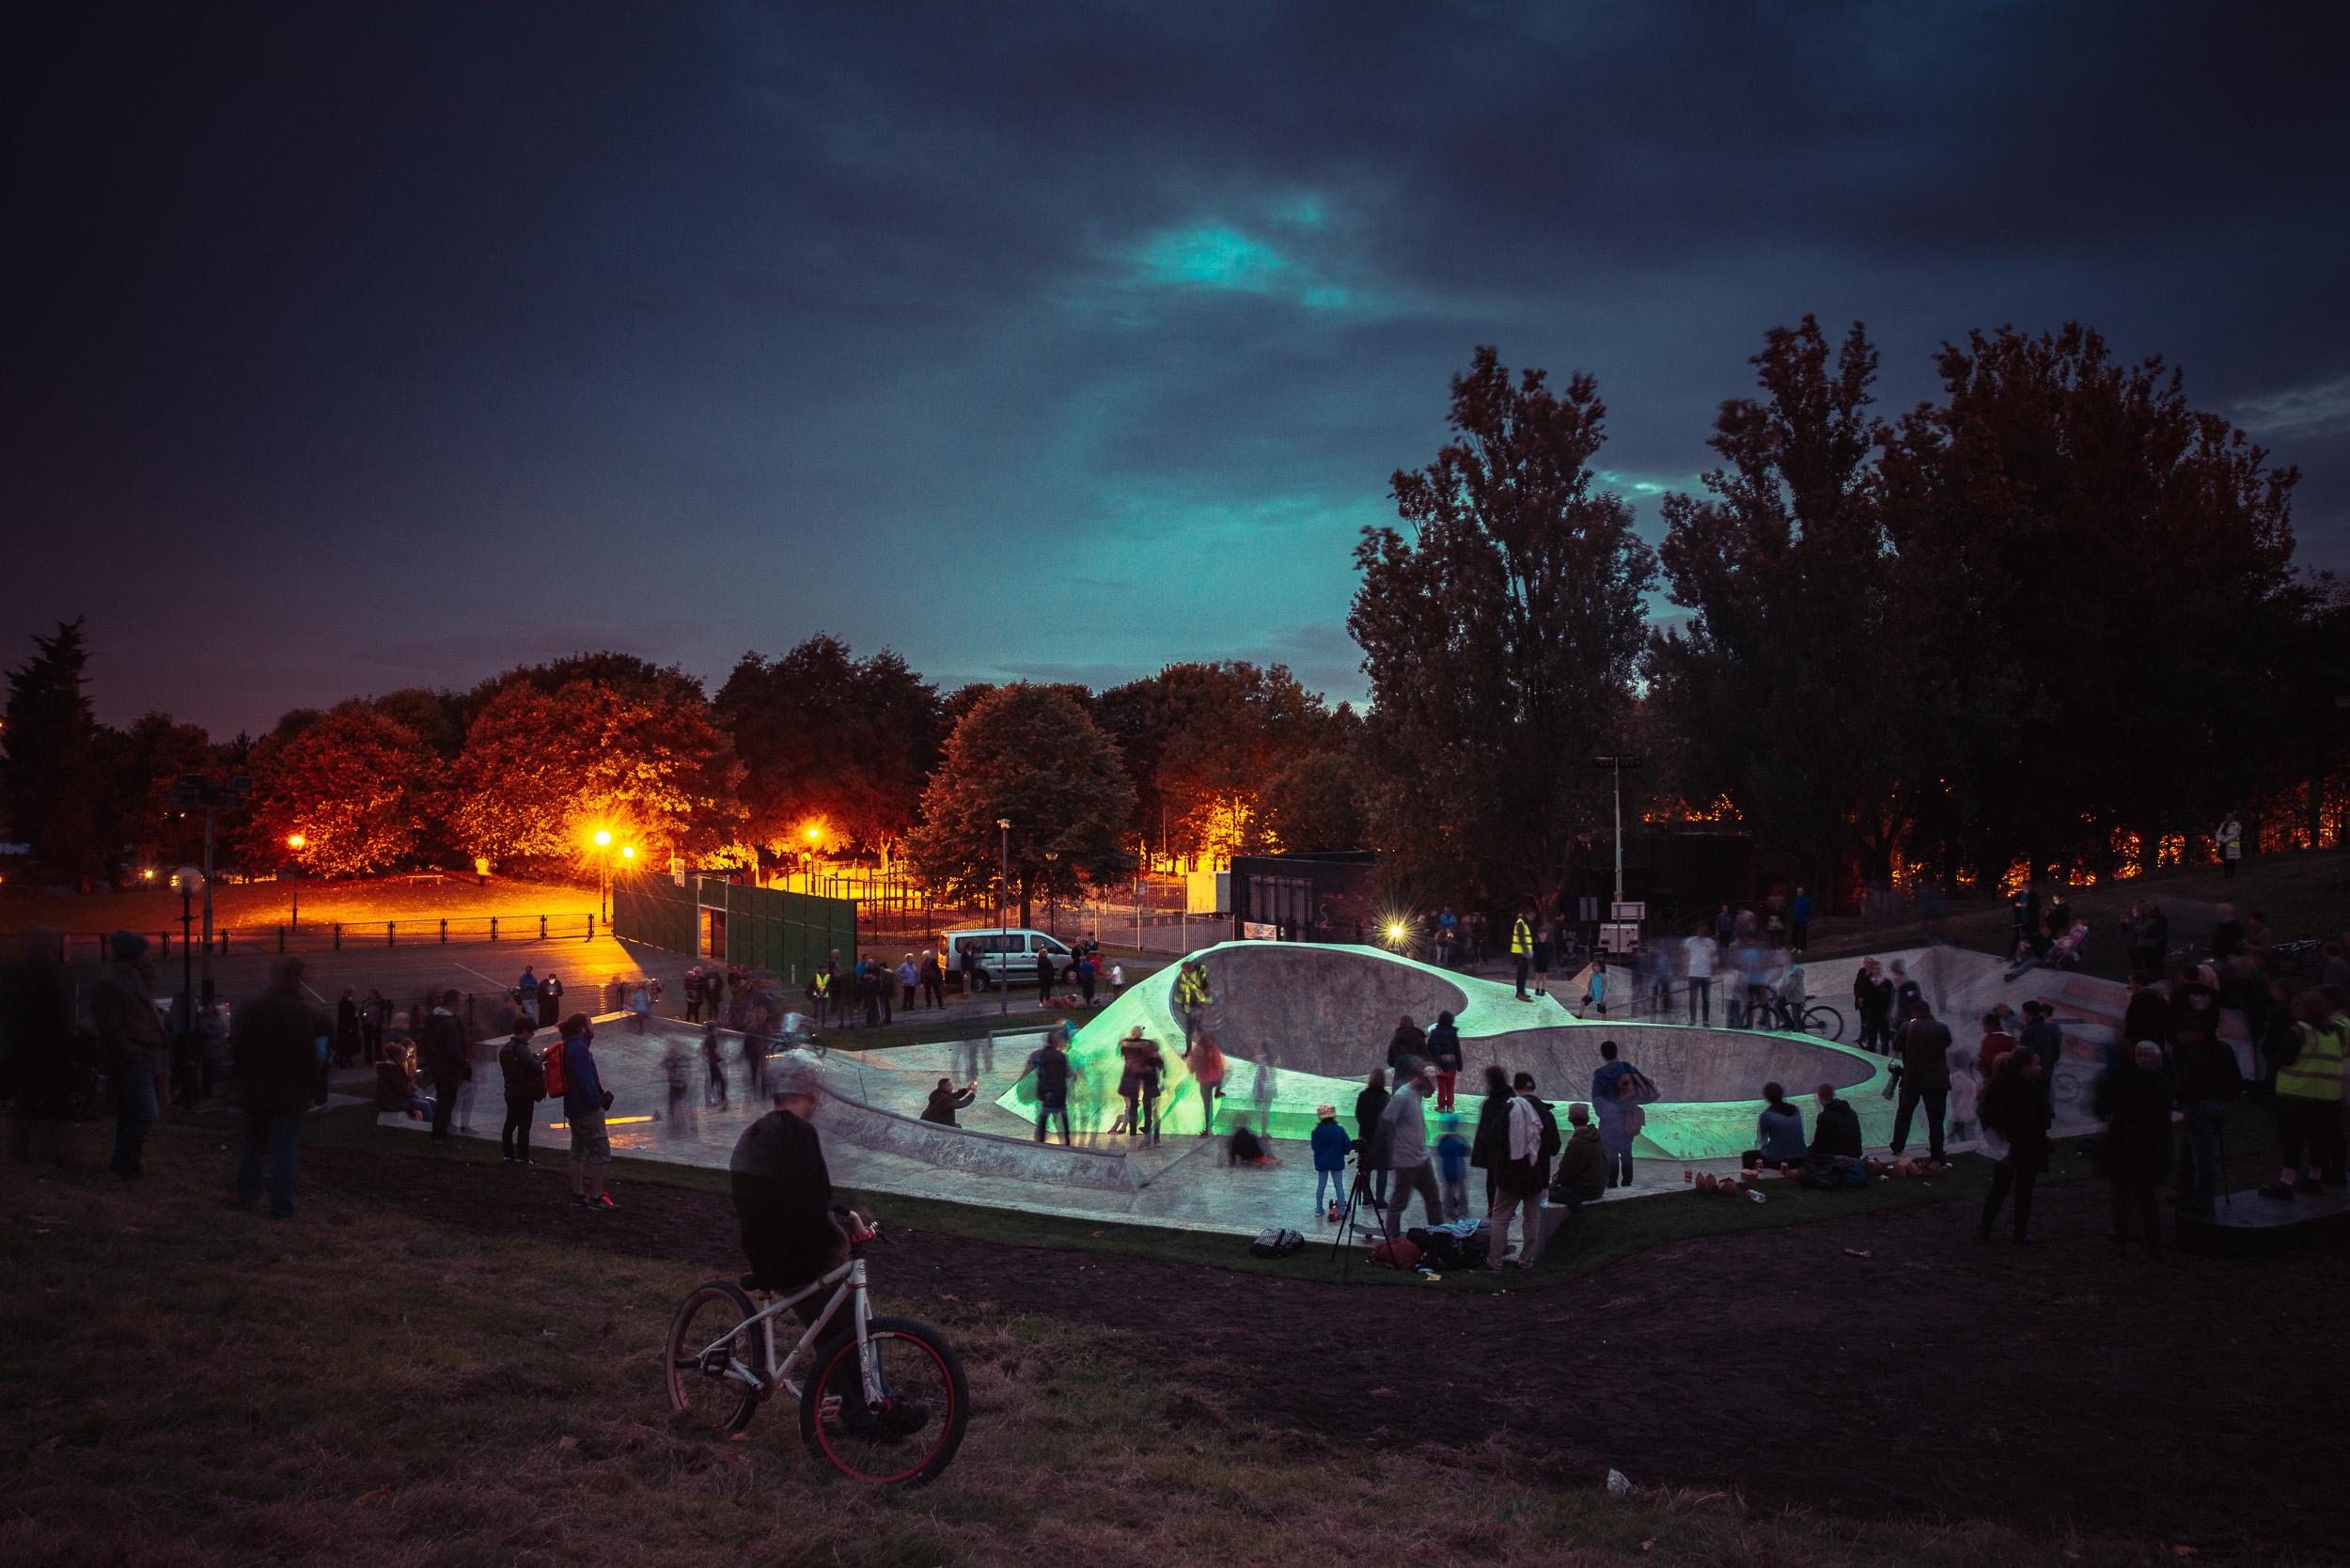 08-biennial-evertro-skatepark-6308-pete-carr.jpg